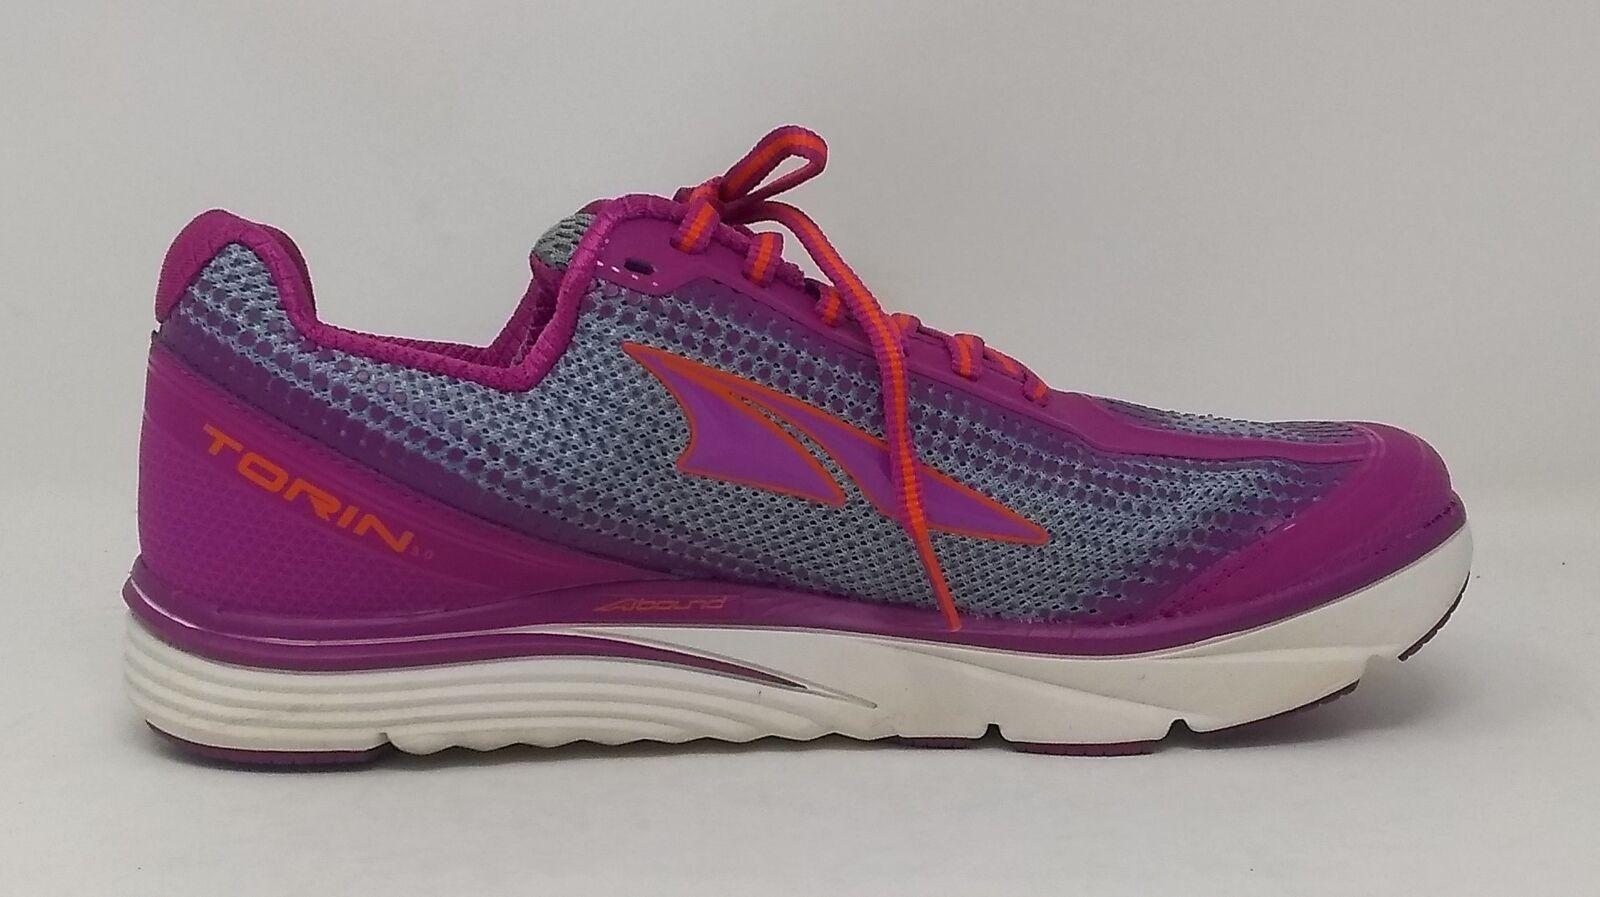 Altra Women's Torin 3 Road Running shoes, Purple orange - 10 B US - USED